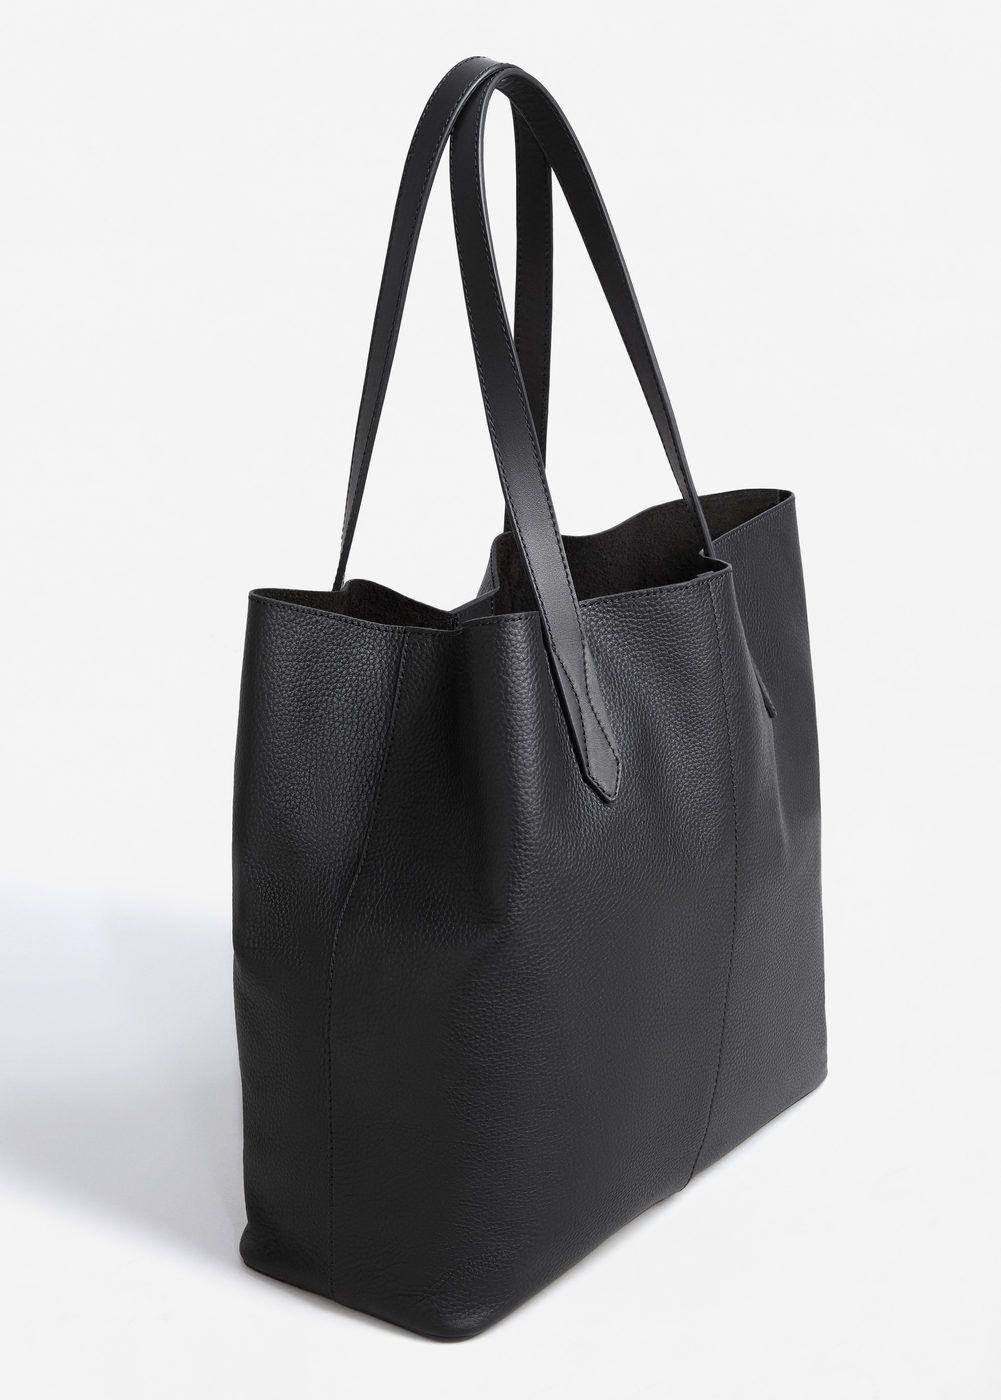 Shopper Bag Aus Leder Damen Mango Deutschland Leather Shopper Bag Leather Bag Design Luxury Tote Bags